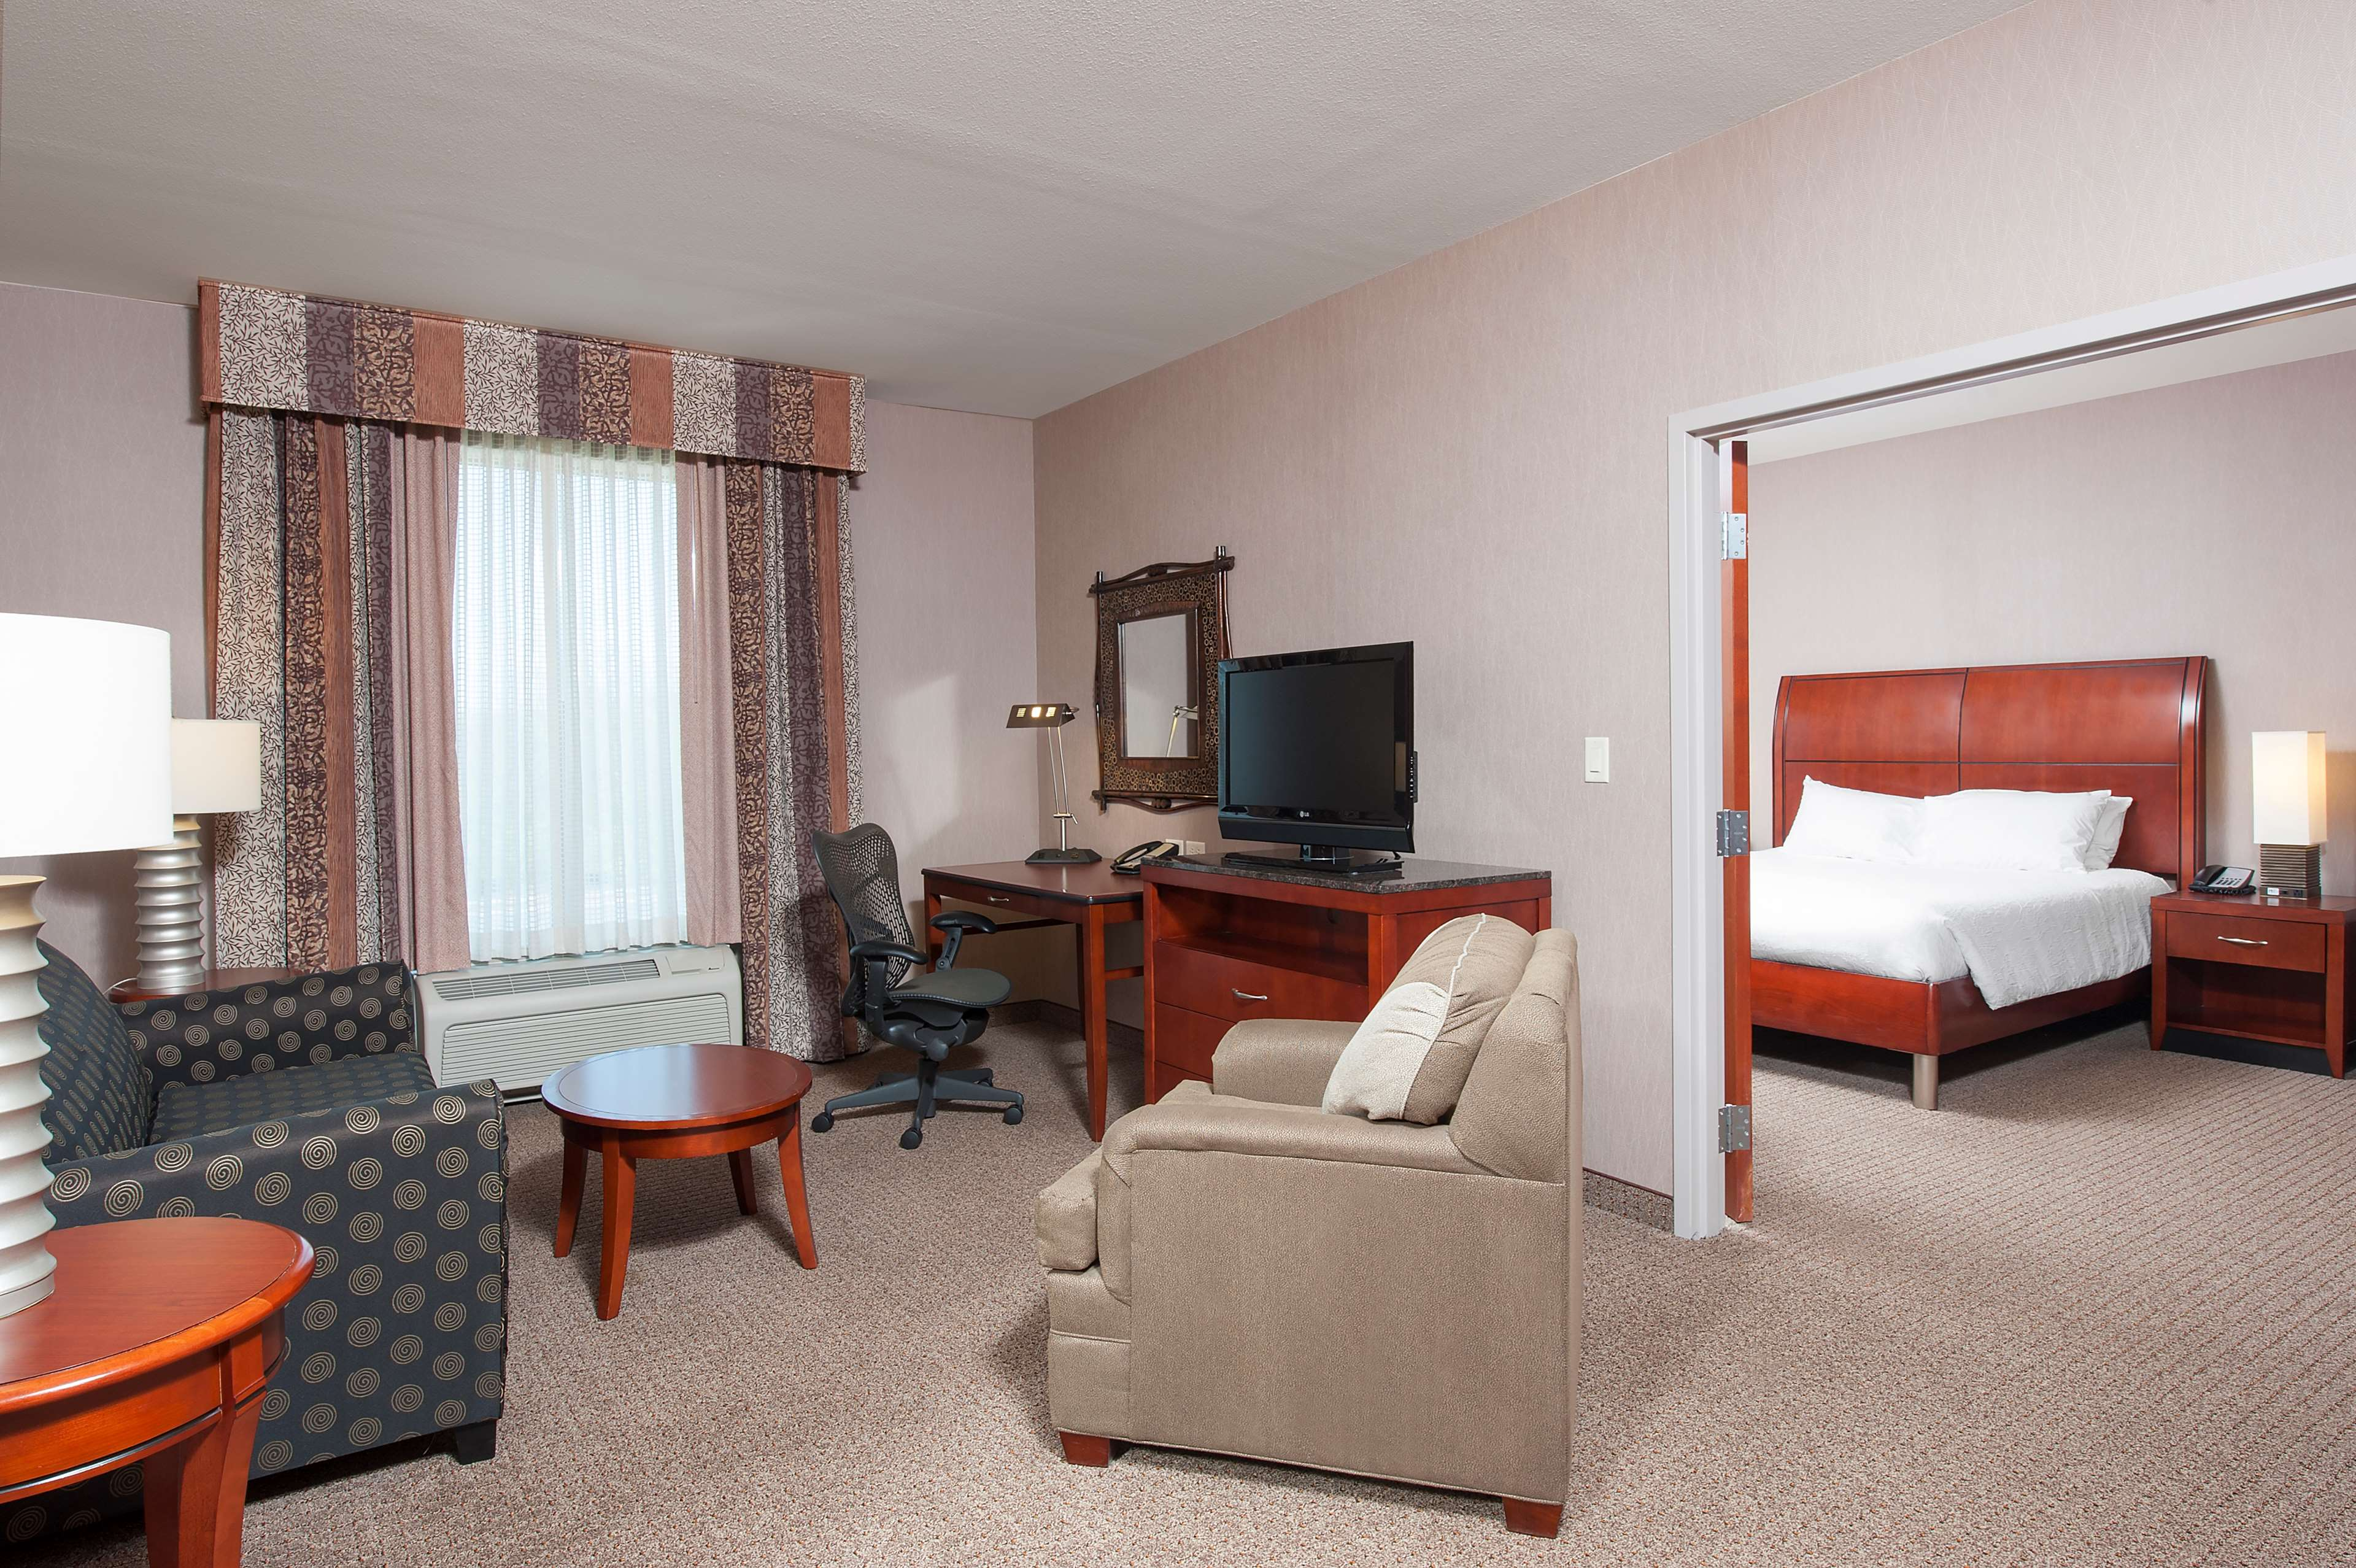 Hilton Garden Inn Indianapolis South/Greenwood image 14